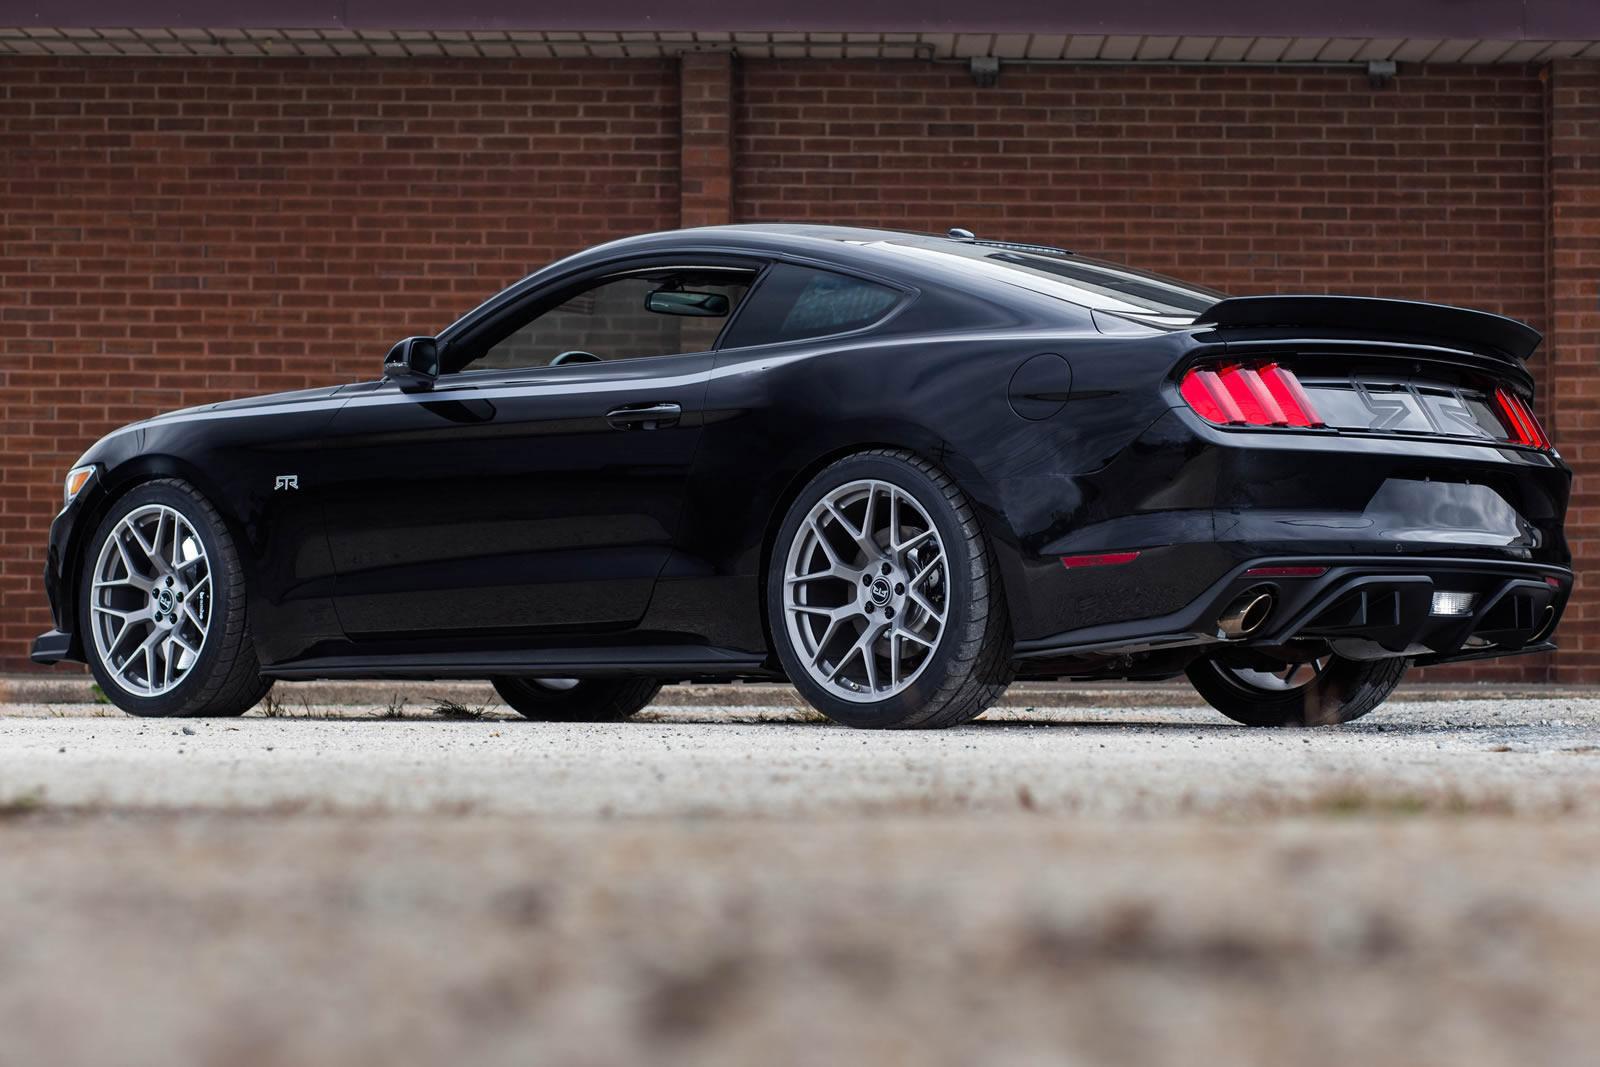 2015 Mustang RTR 4